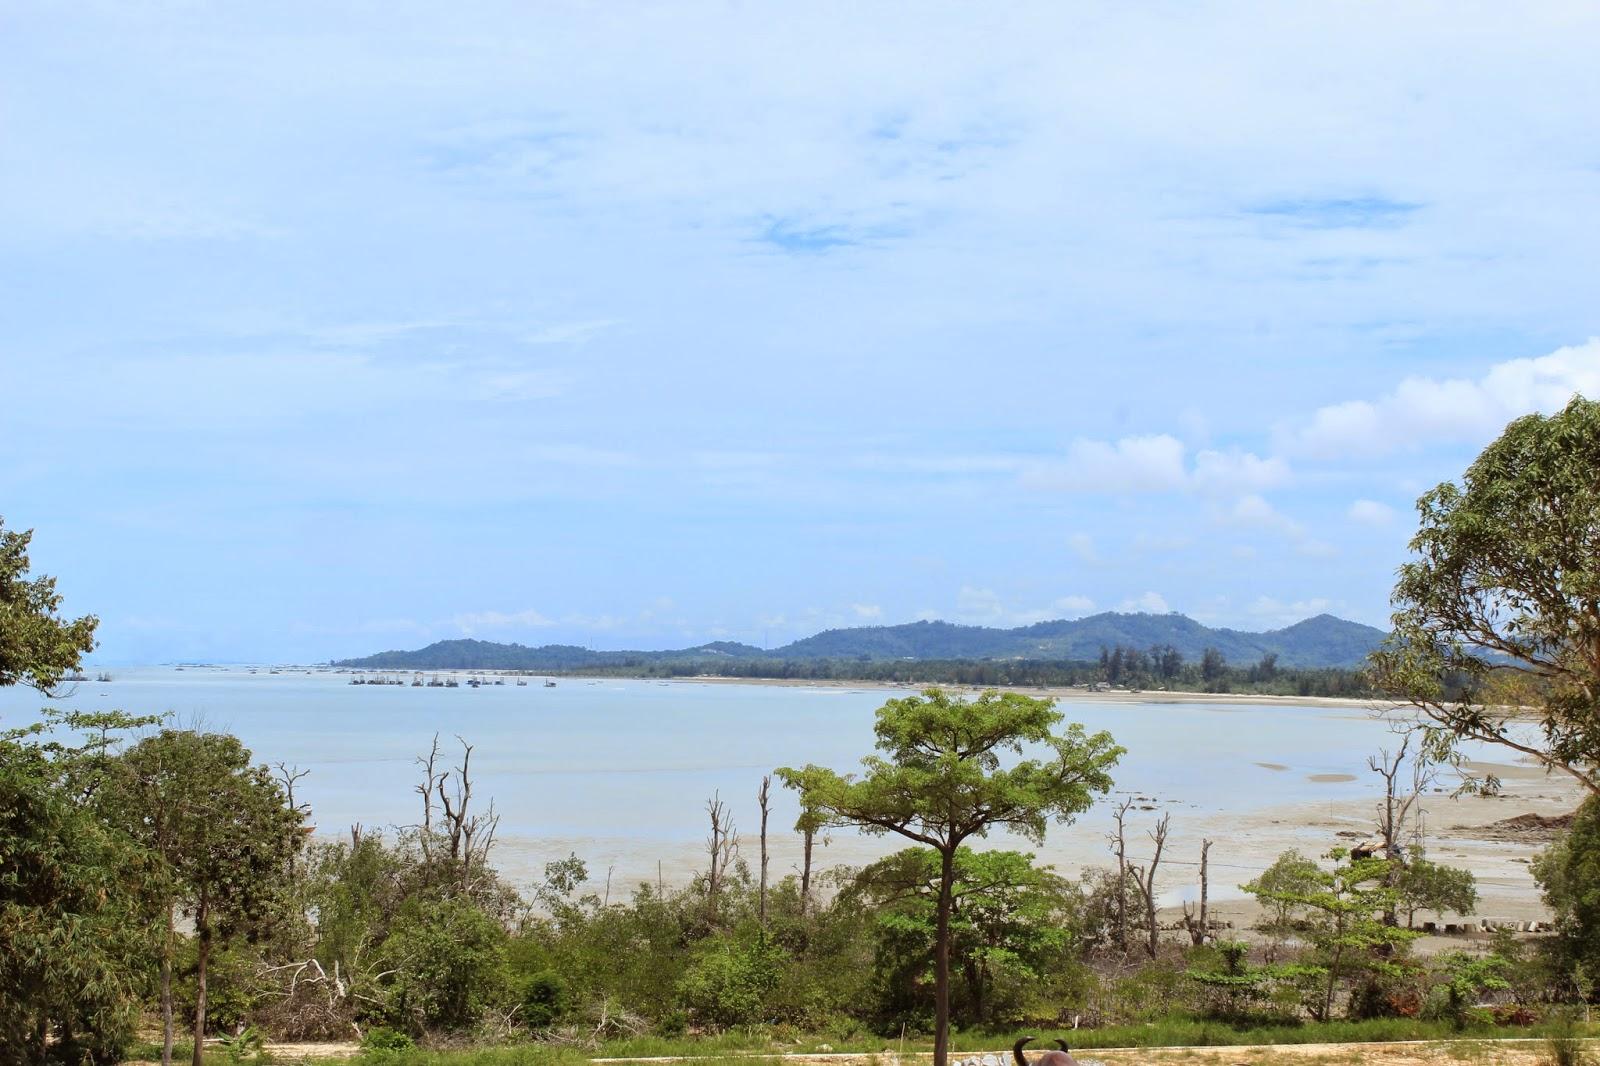 Maroon F3ie Workday Staycation Pangkalpinang Part 3 Pantai Tanjung Bunga